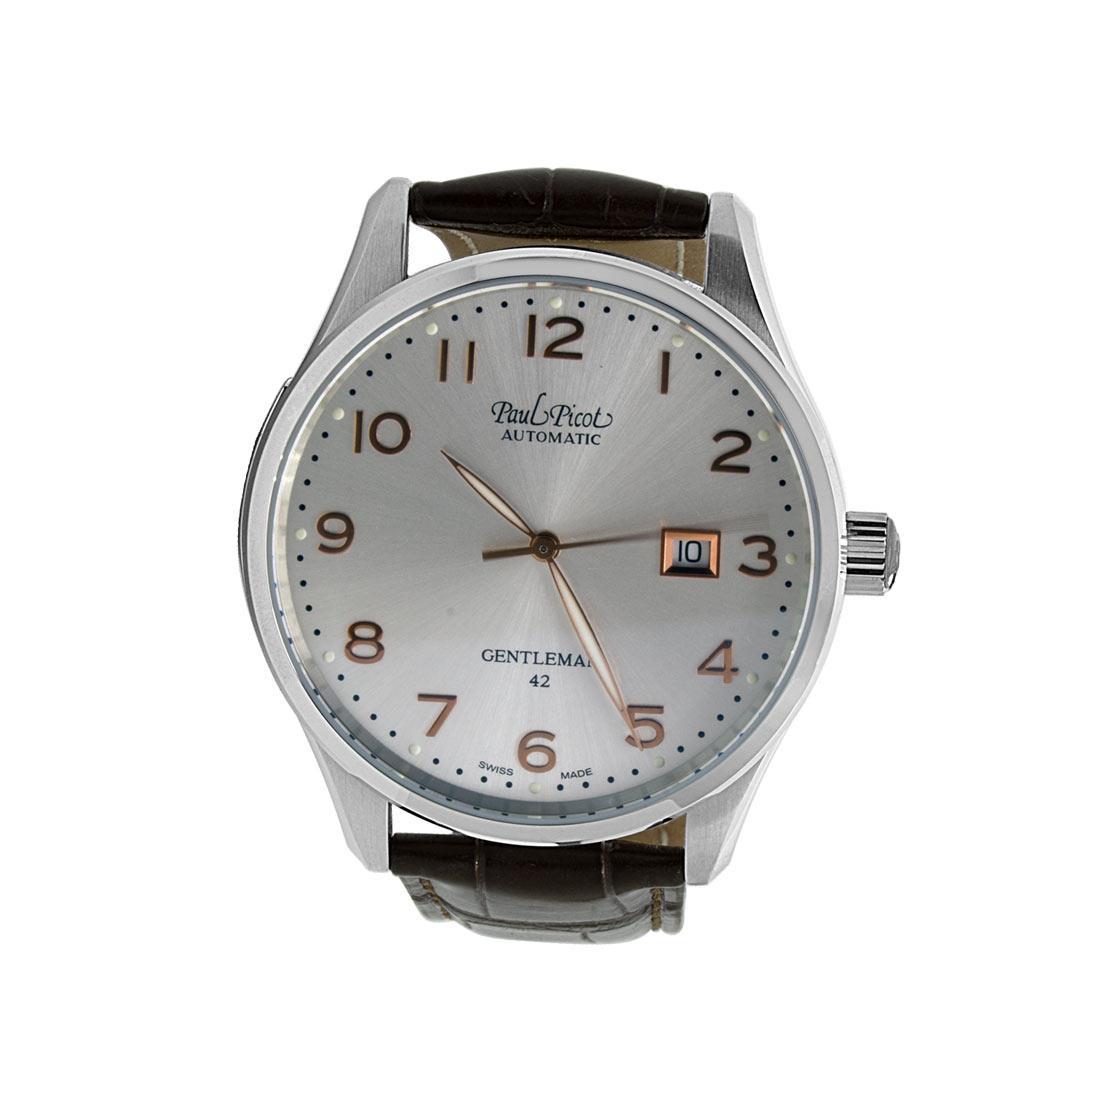 Orologio Paul Picot Gentleman da uomo, cassa 42mm - PAUL PICOT